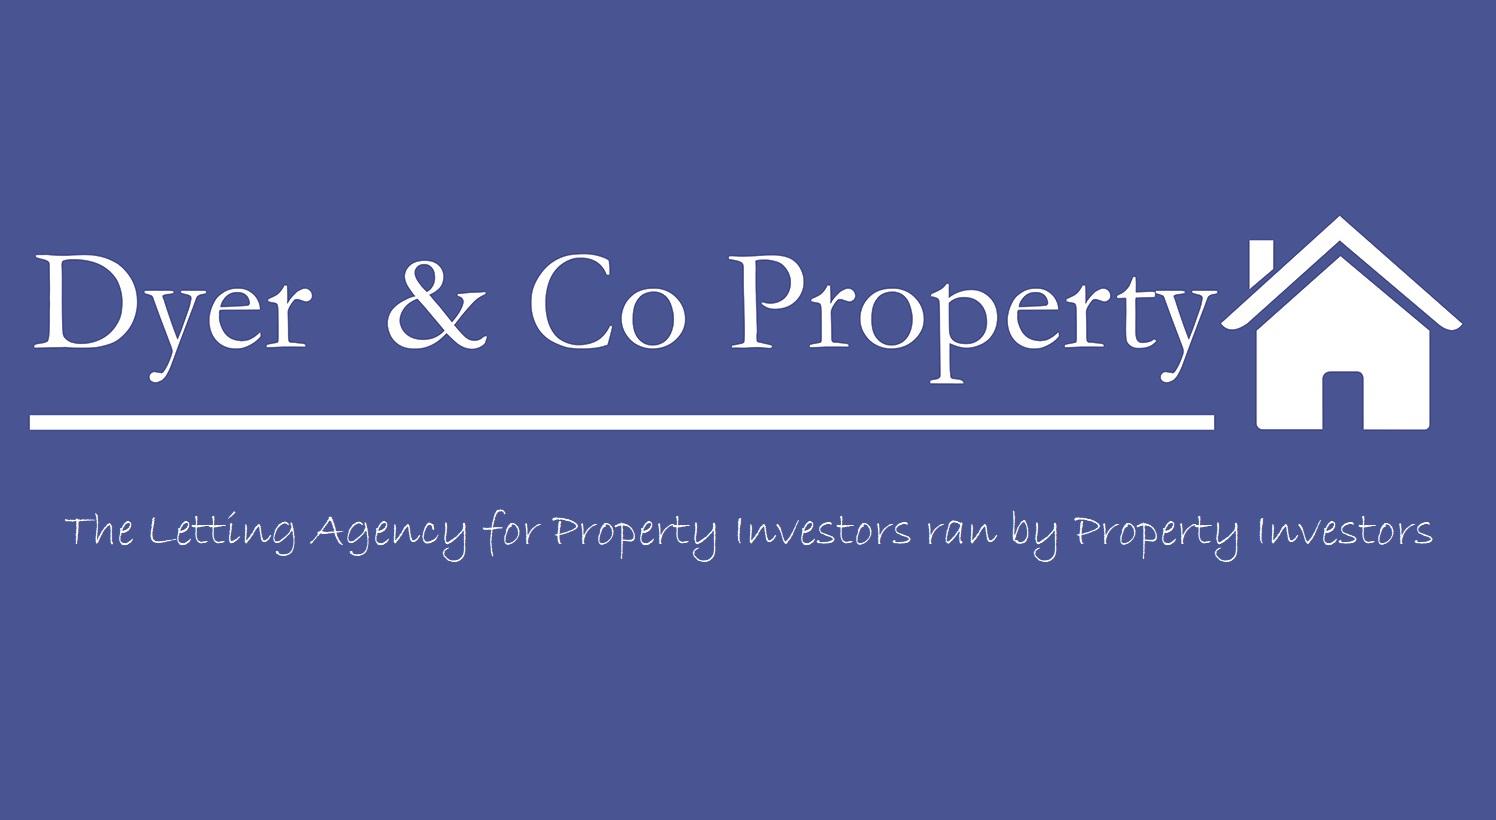 Dyer & Co Property